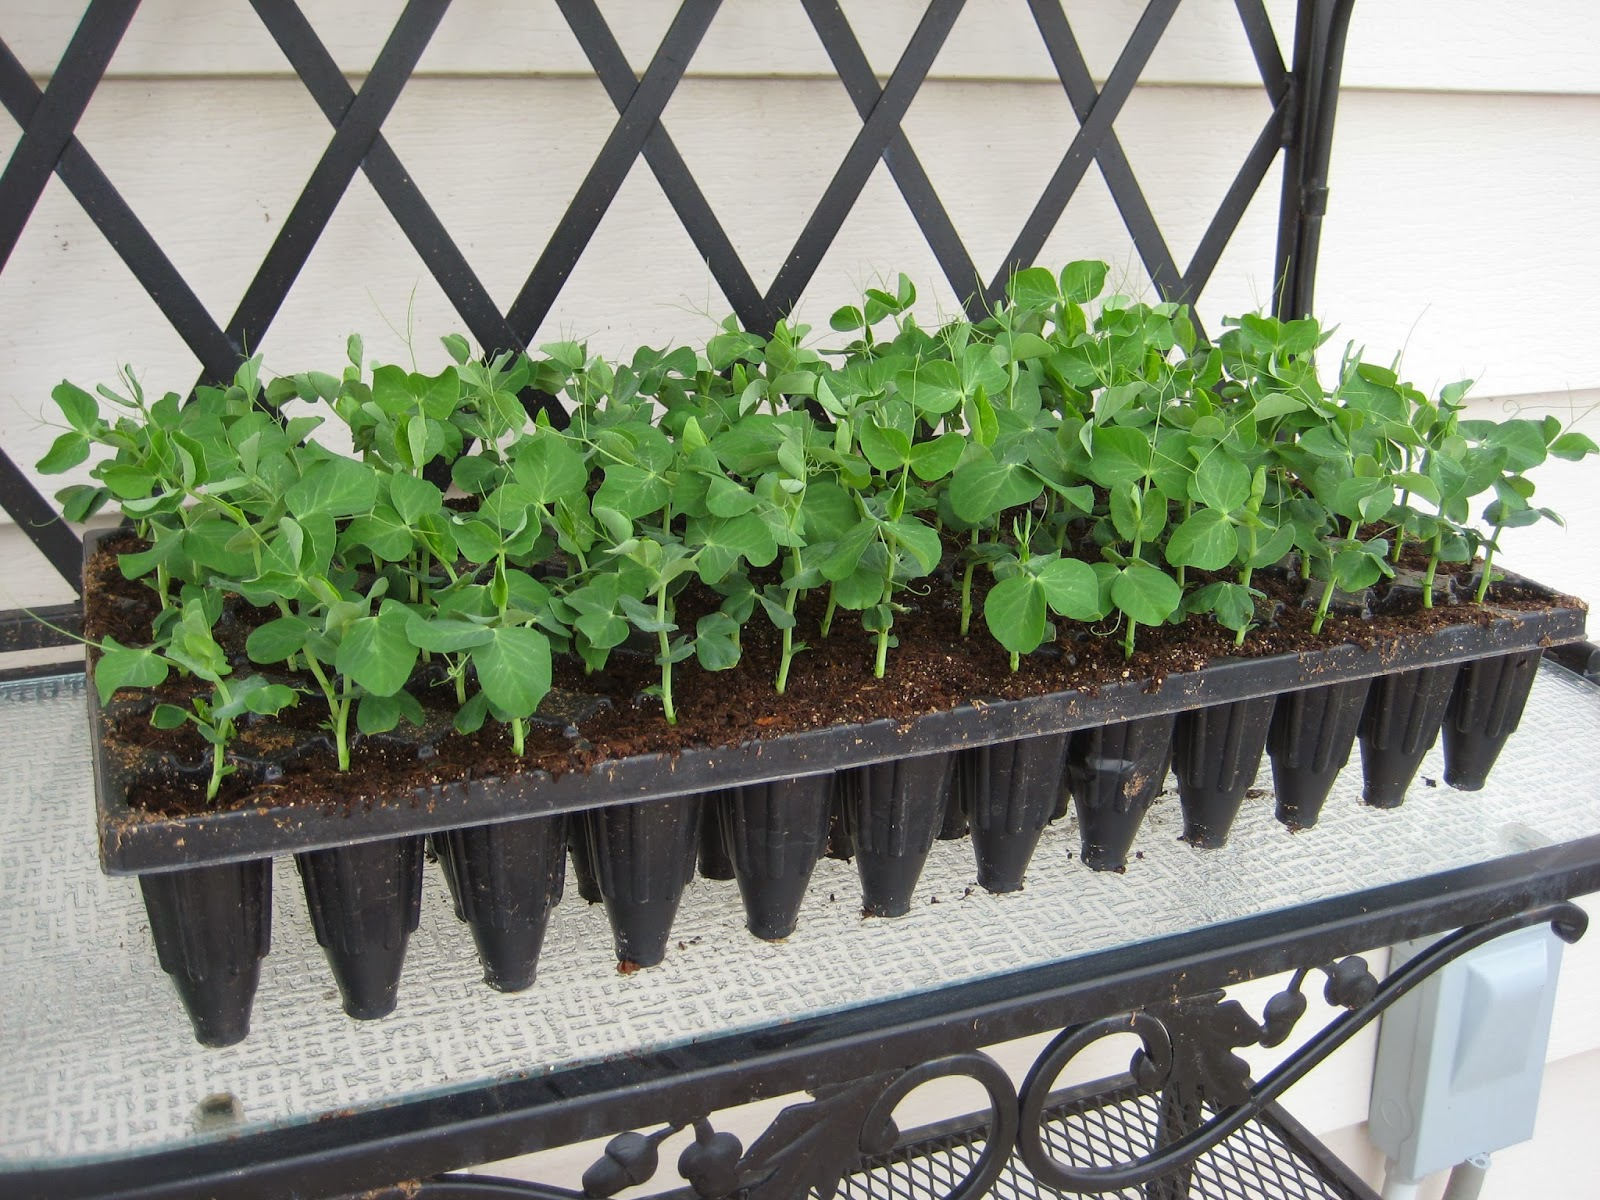 seed-starting kits, deep root insert